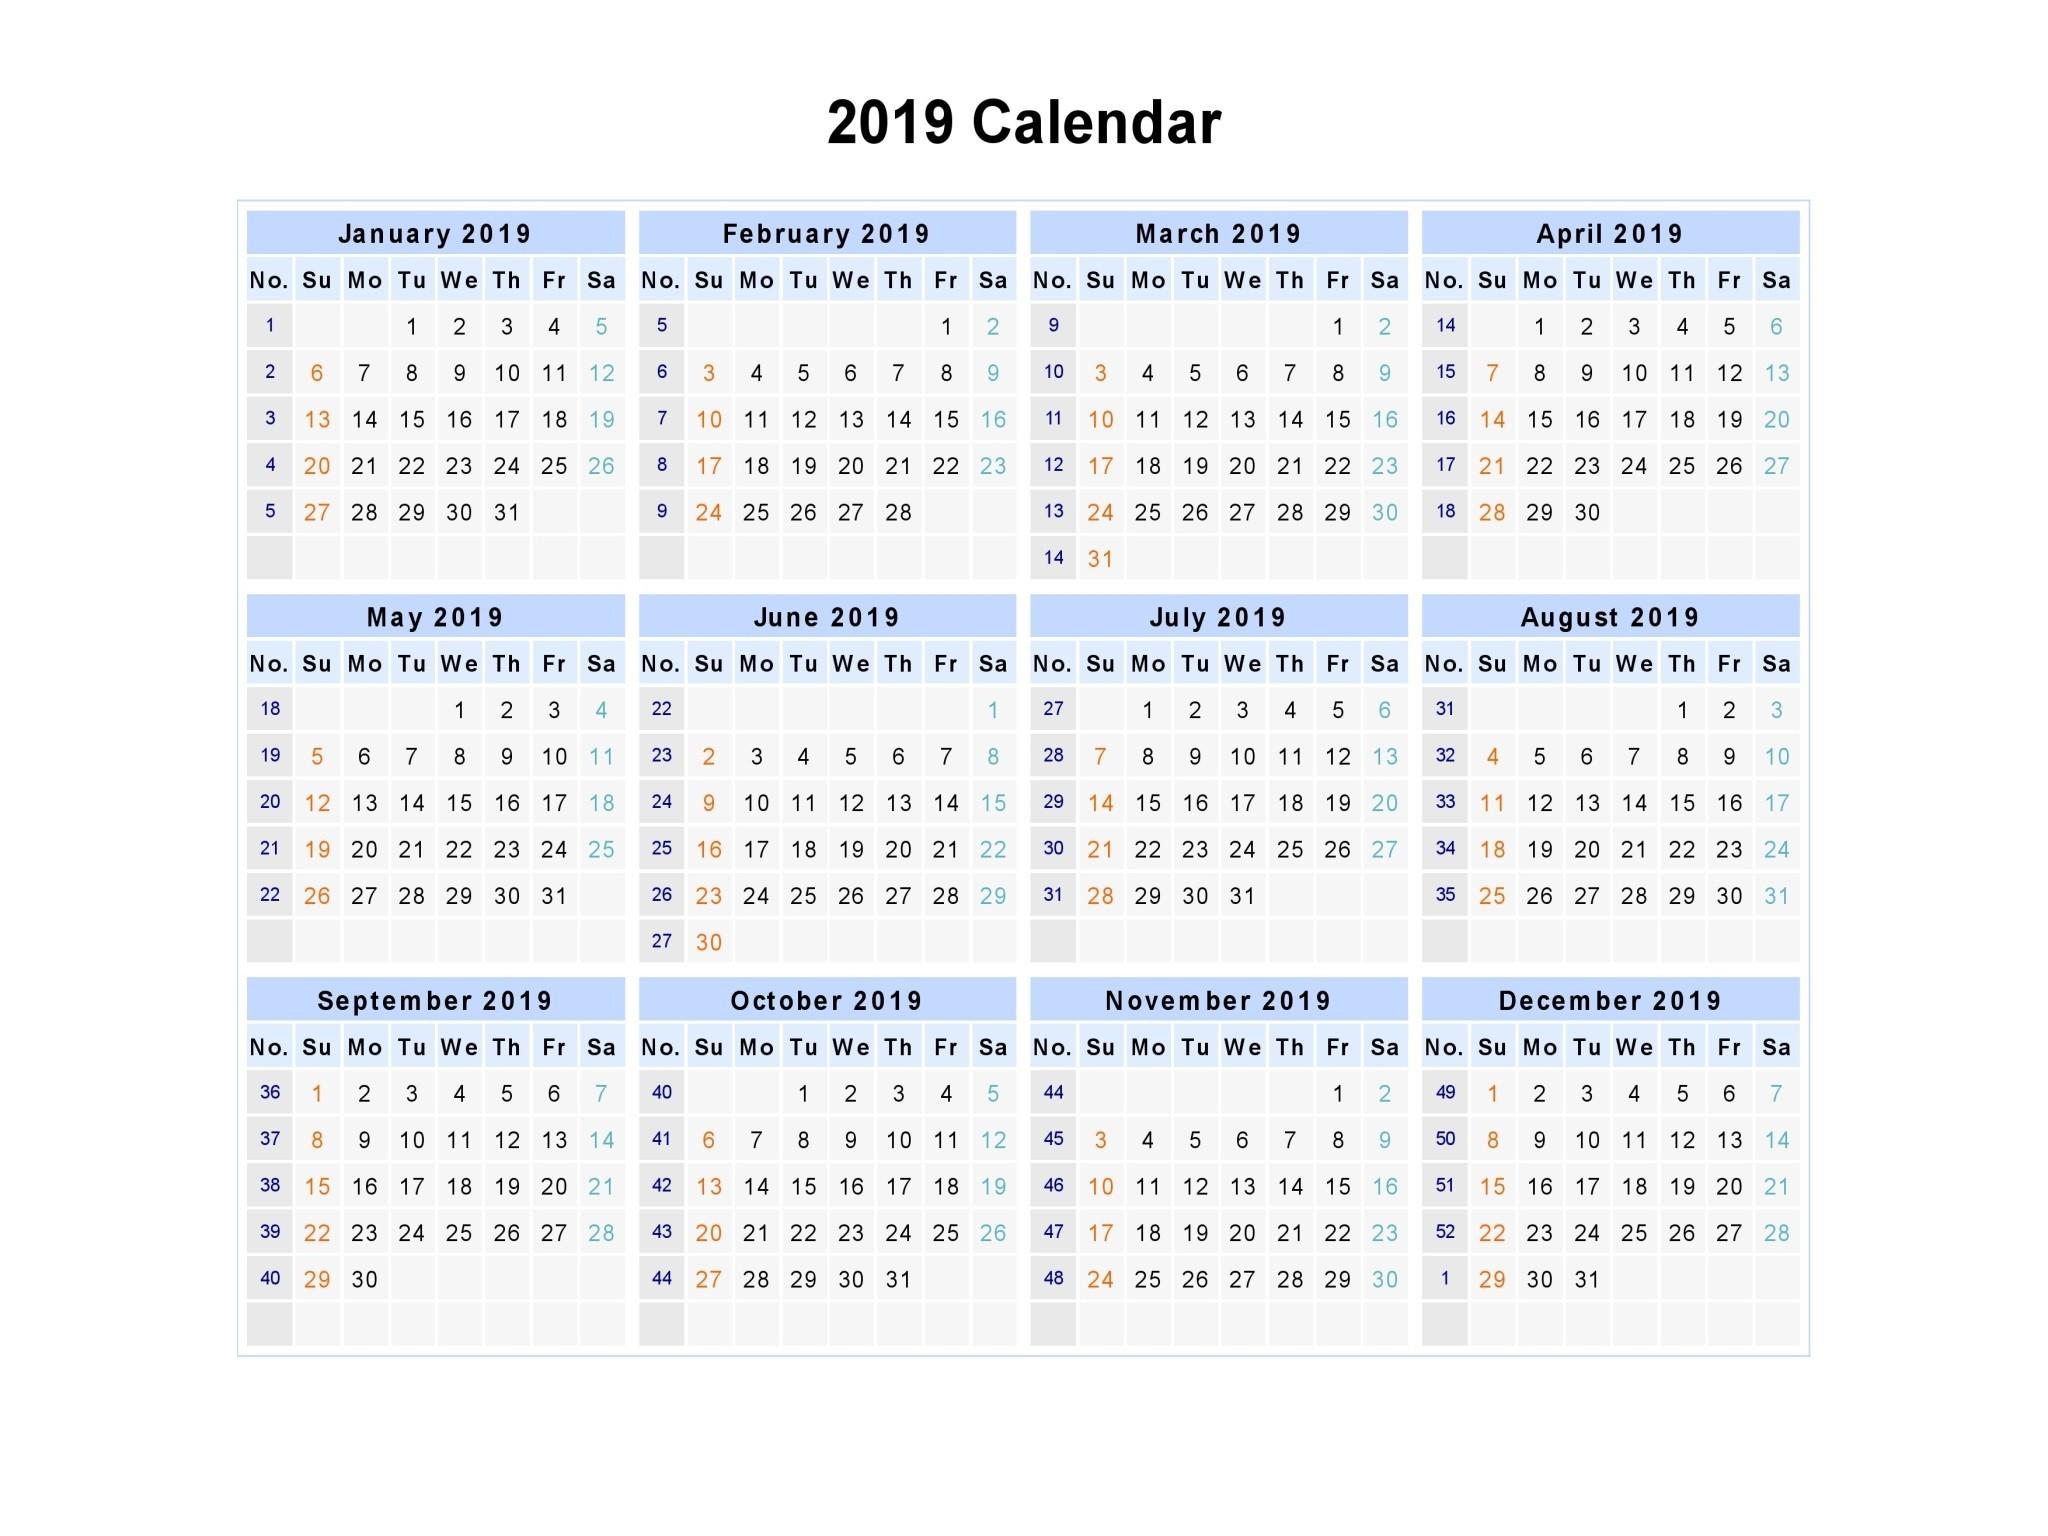 Free printable calendar templates calendar Week 2019 excel theme picturesque calender